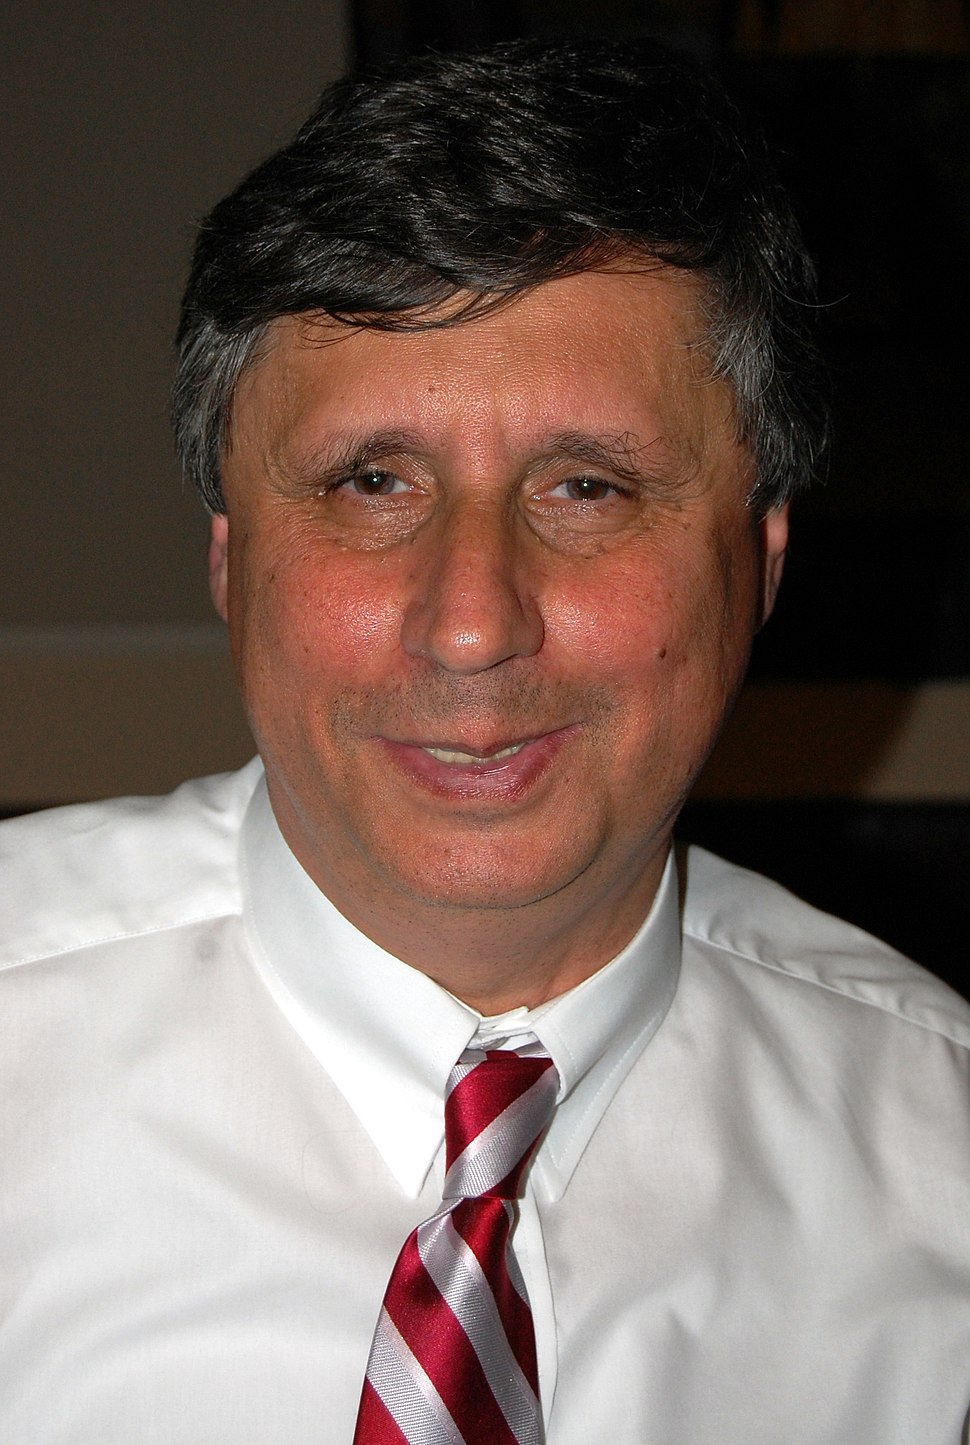 Prime Minister of the Czech Republic Jan Fischer